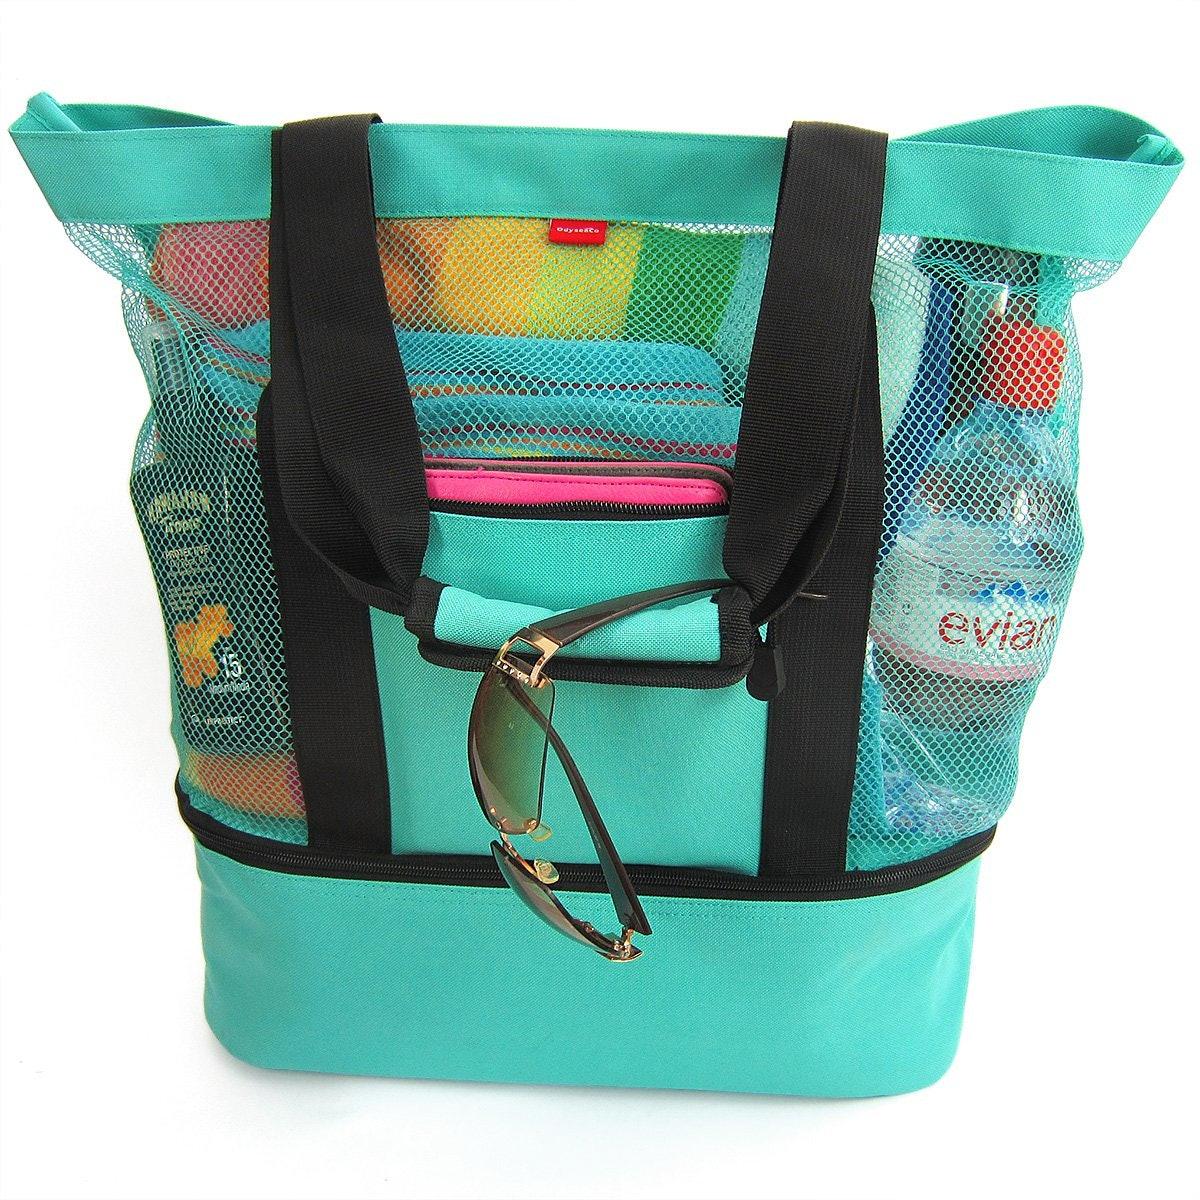 OdyseaCo Aruba Mesh Beach Tote Bag with Zipper Top and Insulated Picnic Cooler